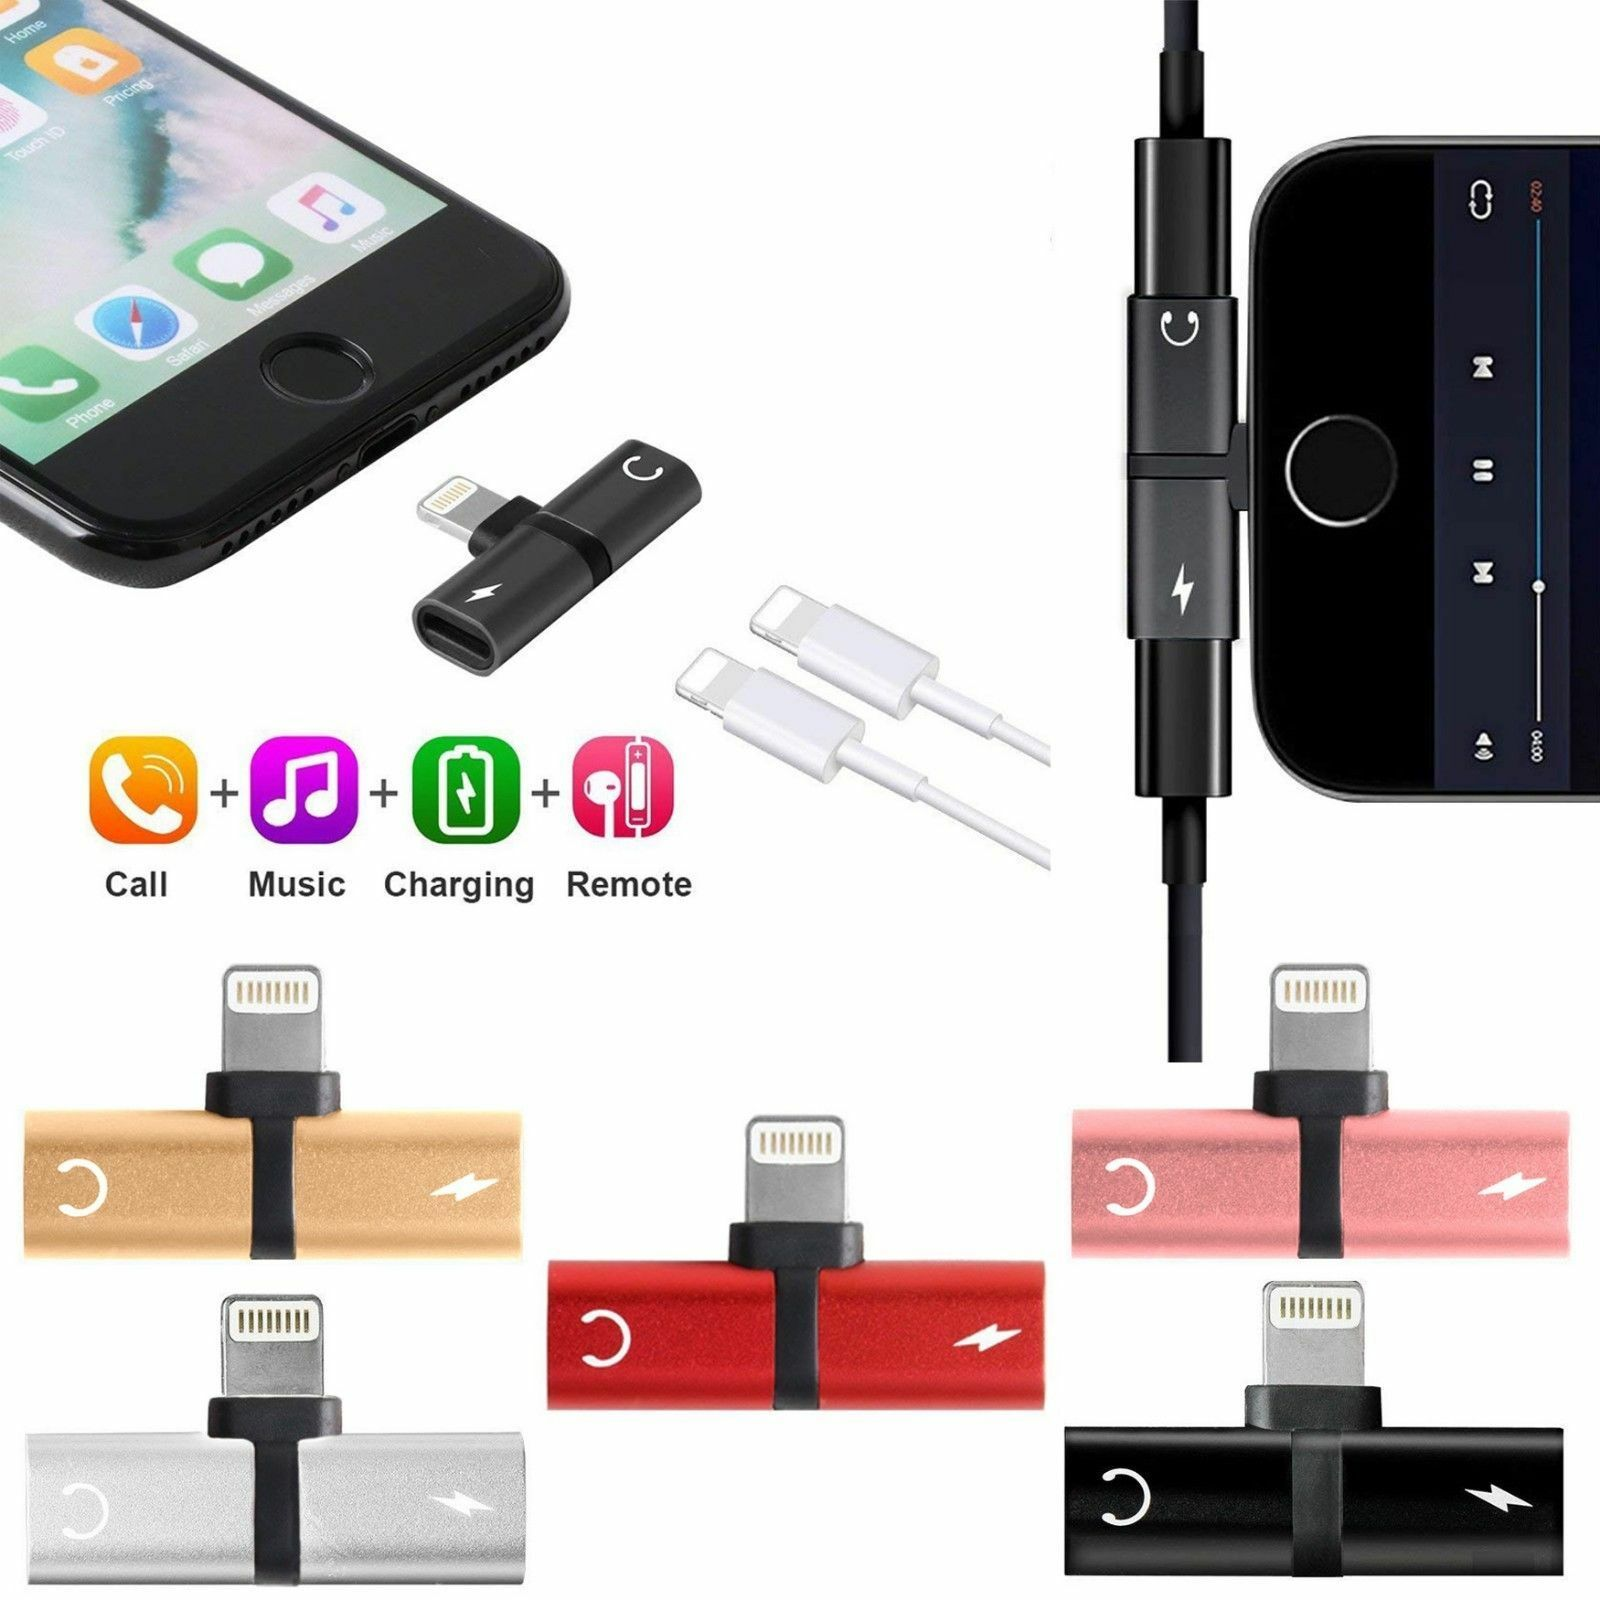 Smart Connect Iphone 7 Splitter Headphone Charging Adapter Apple Lightning Tech For Sale Online Ebay